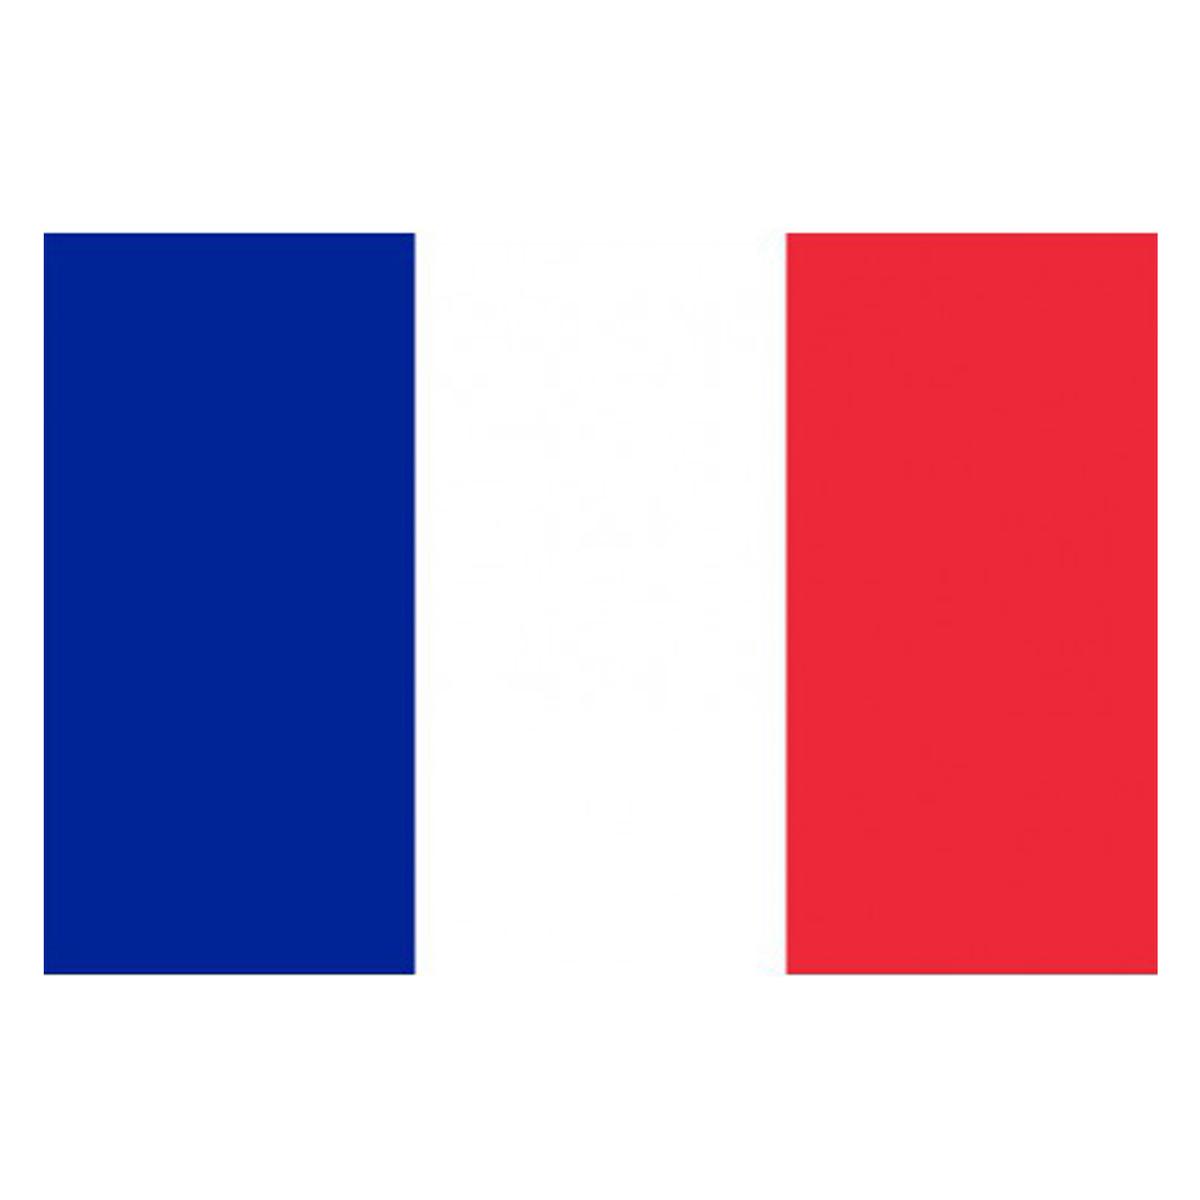 Drapeau \'France\' bleu blanc rouge - 90x150 cm - [J1616]